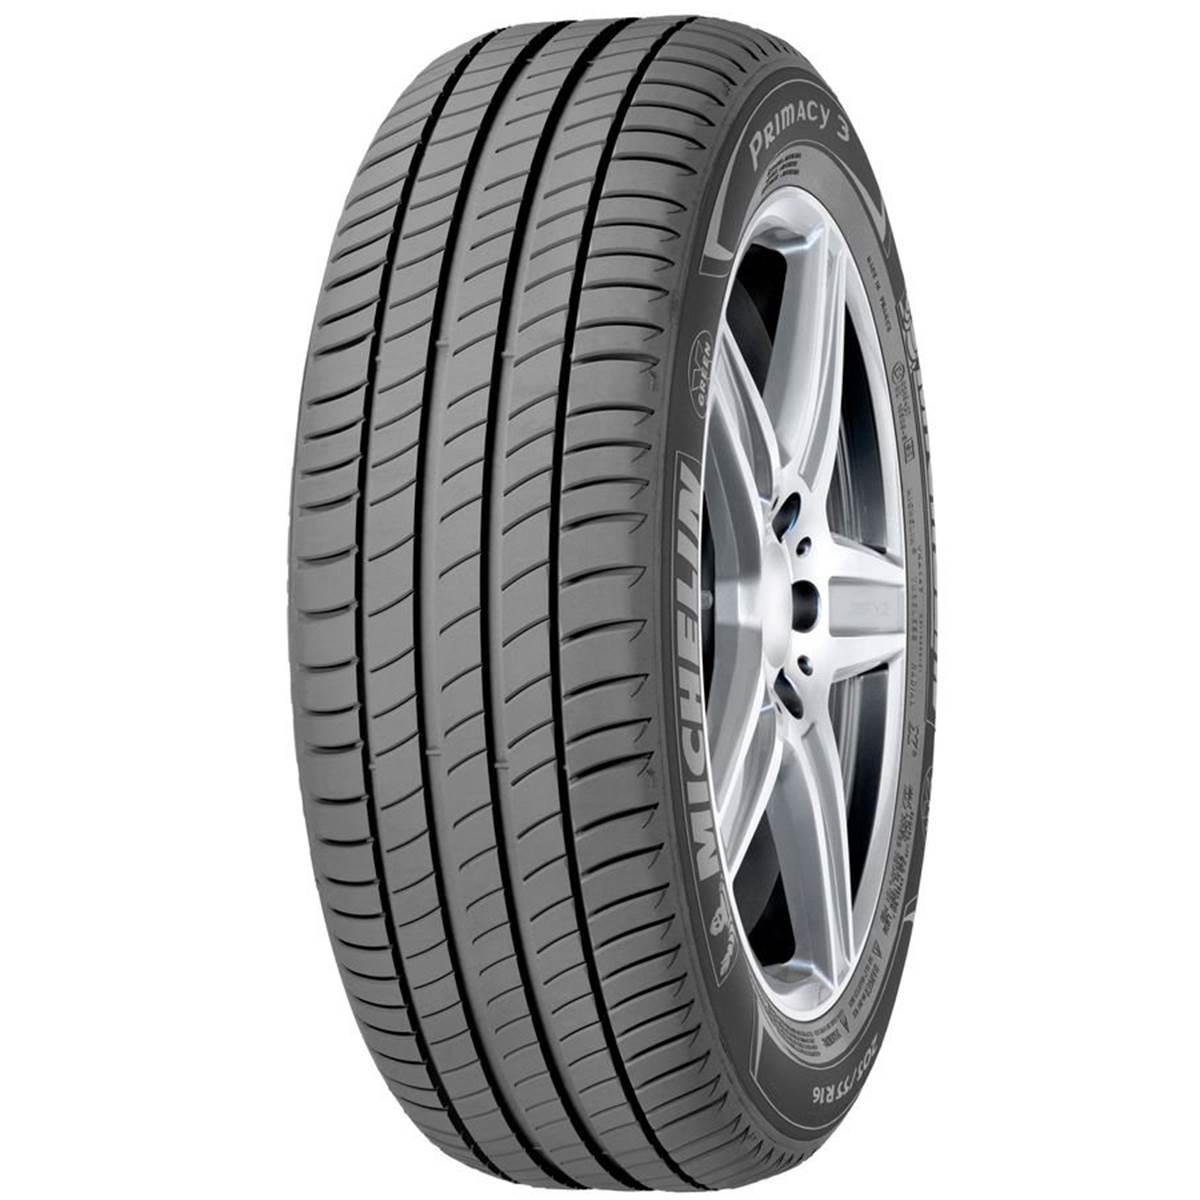 Pneu Michelin 245/55R17 102W Primacy 3